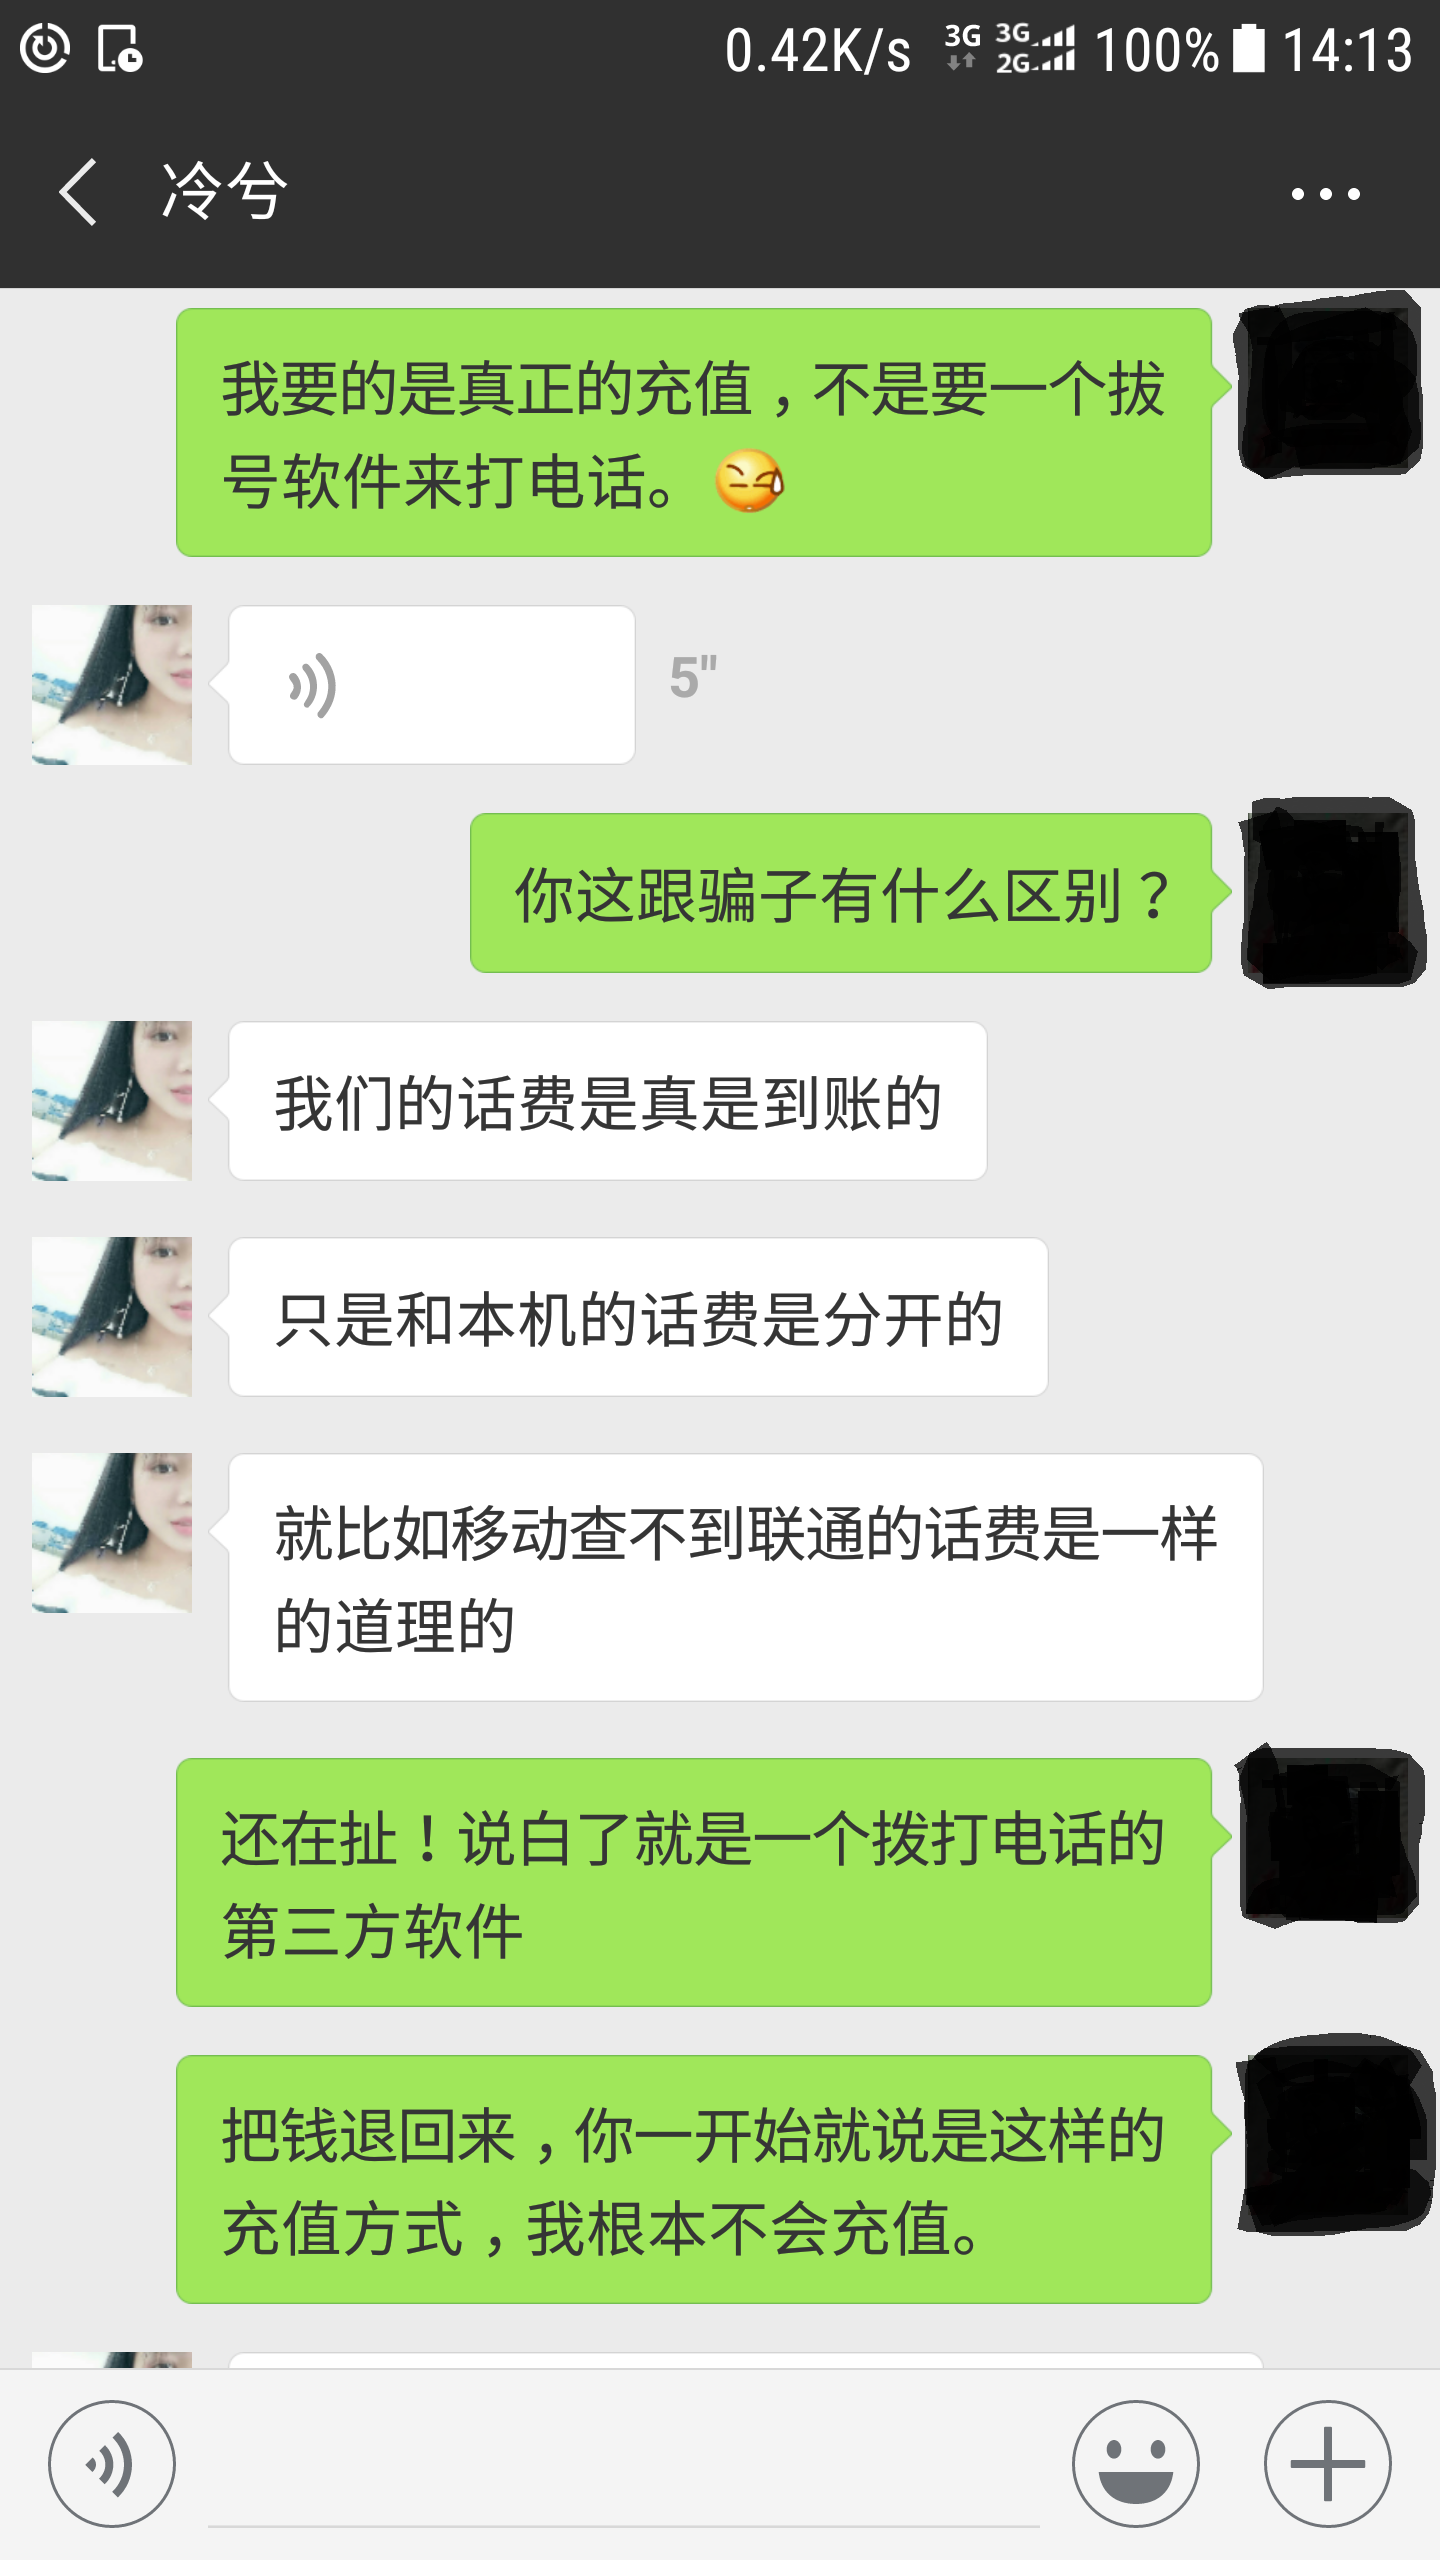 Screenshot_20180705-141322.png